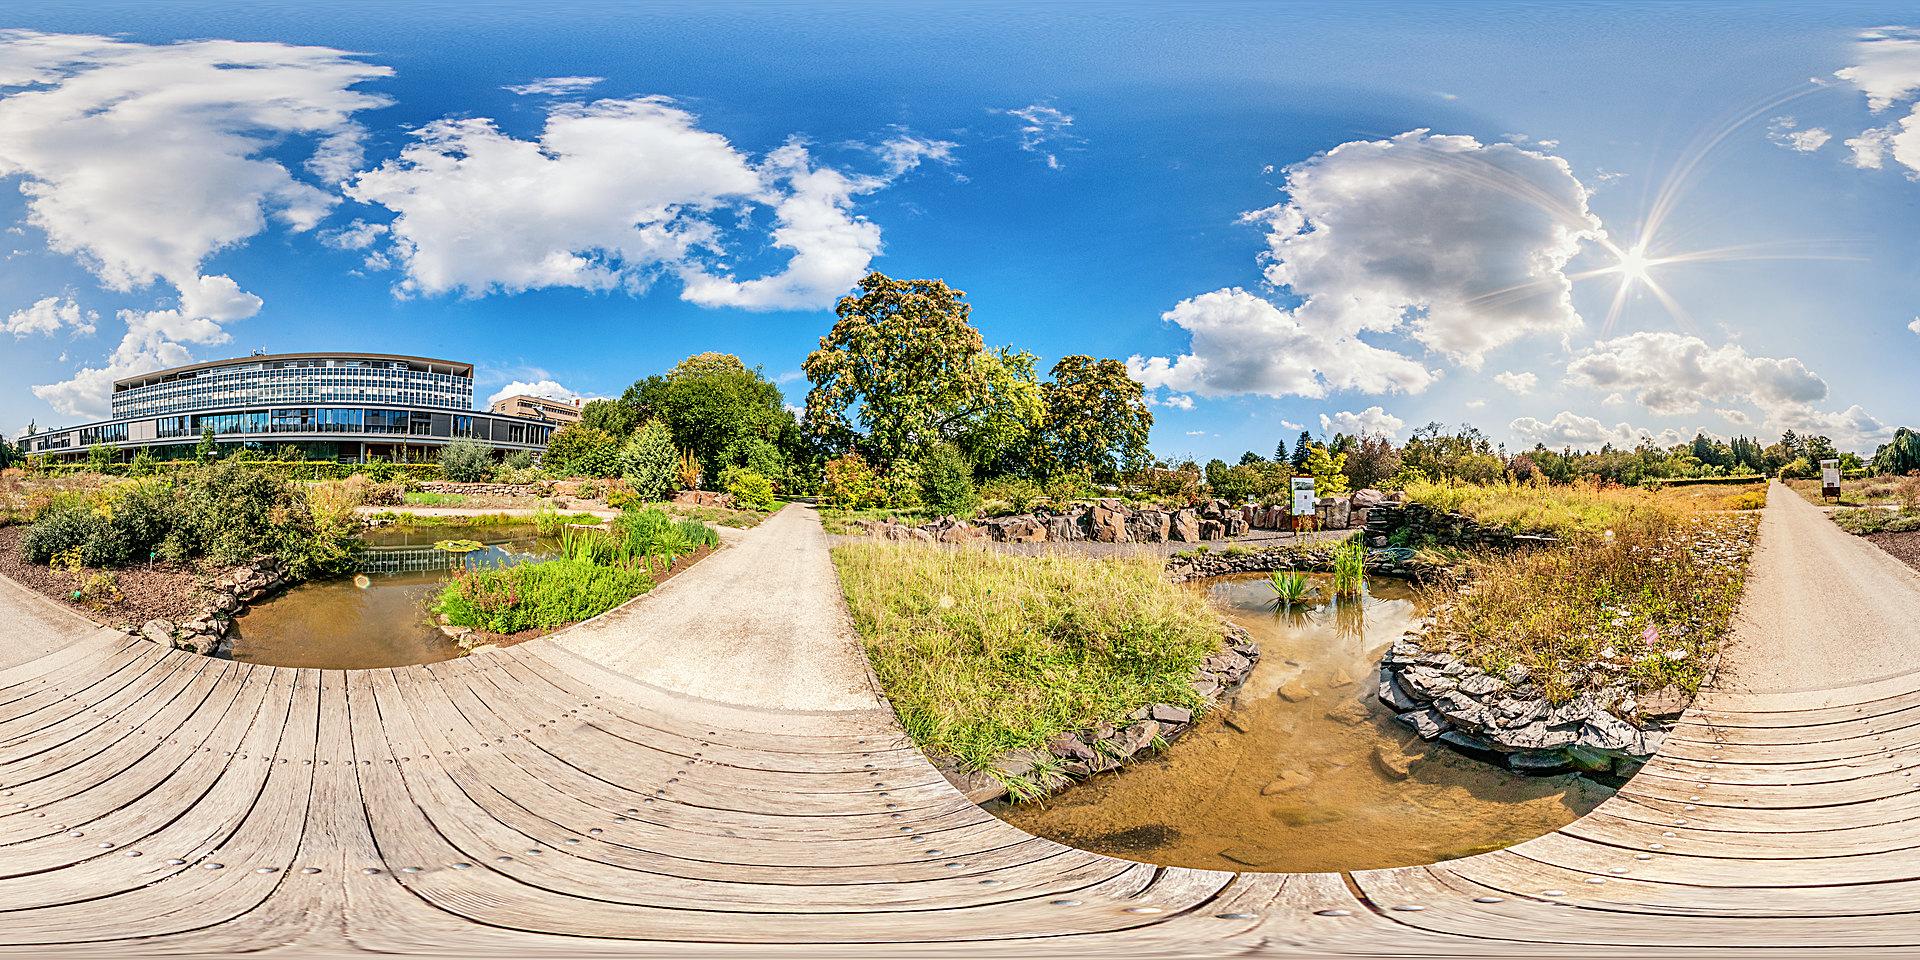 Botanischer Garten Mainz - Freiland